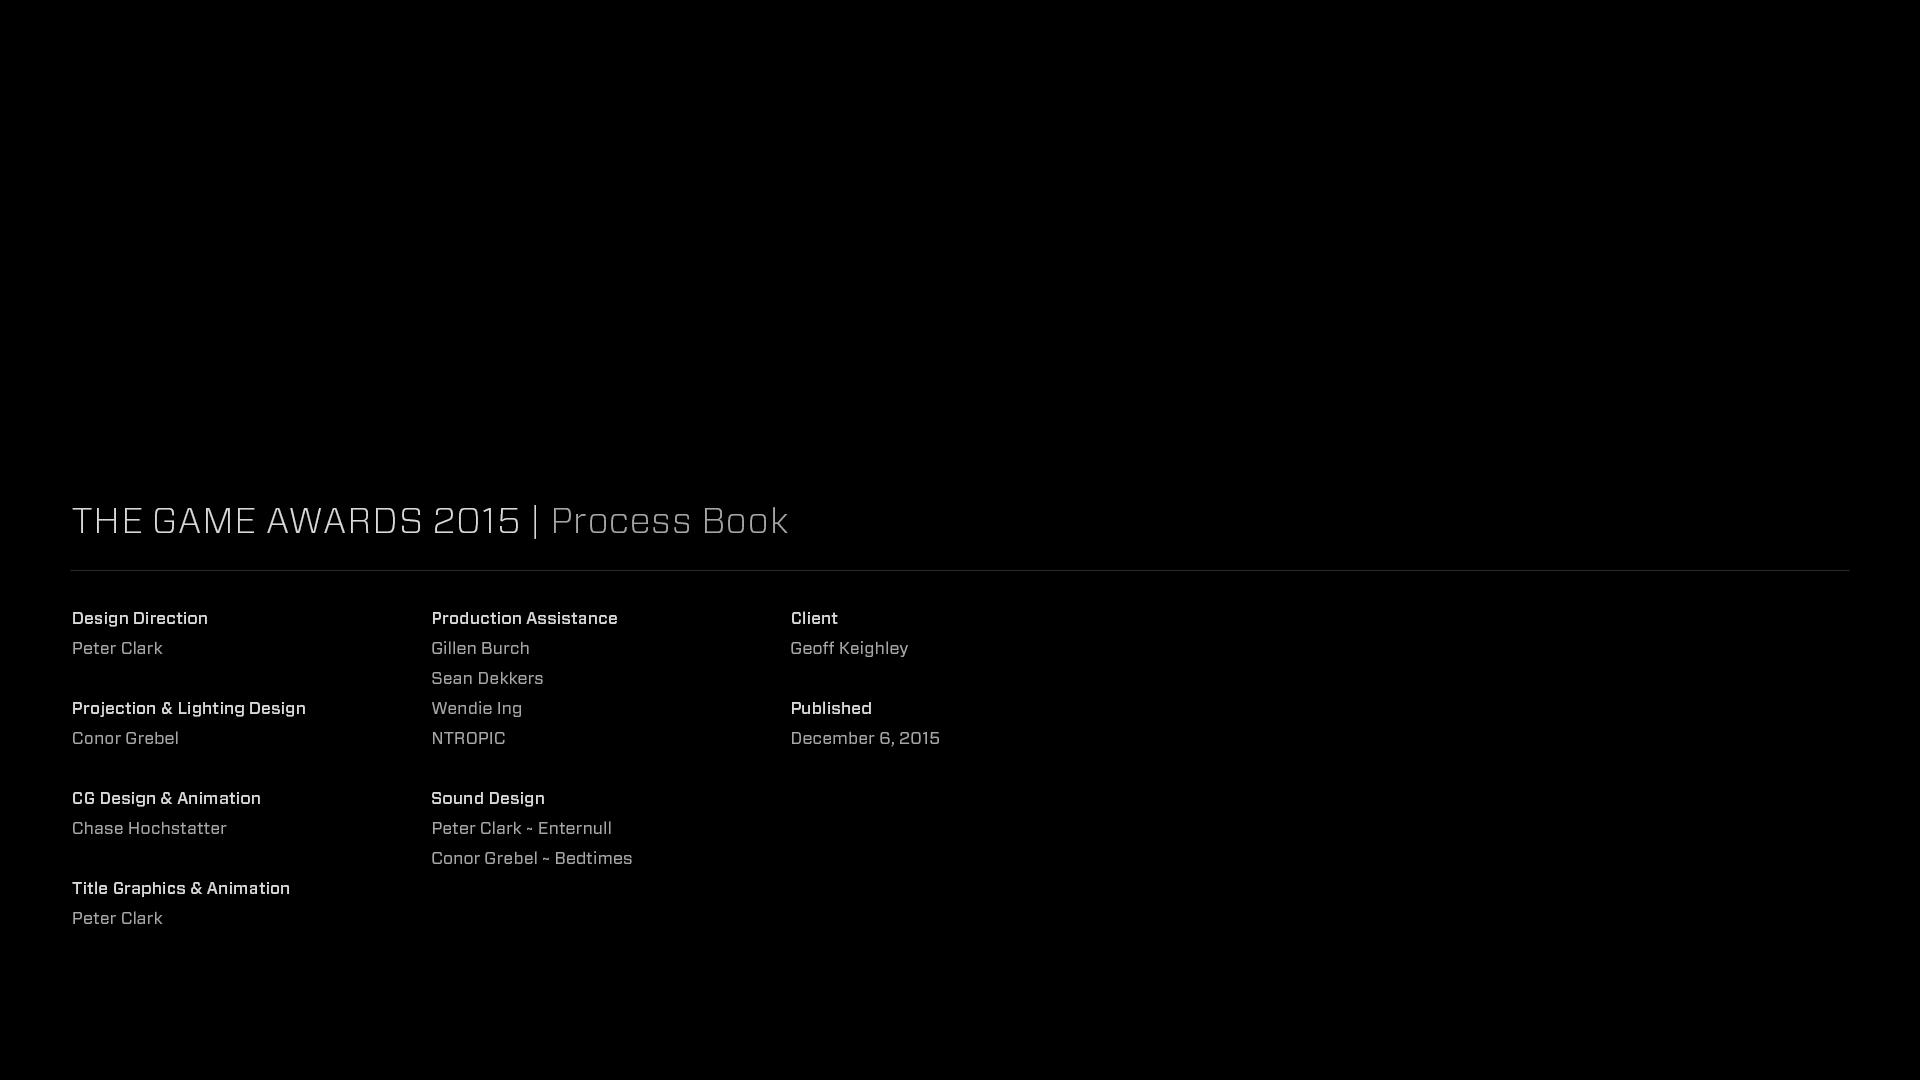 The Game Awards Process Book